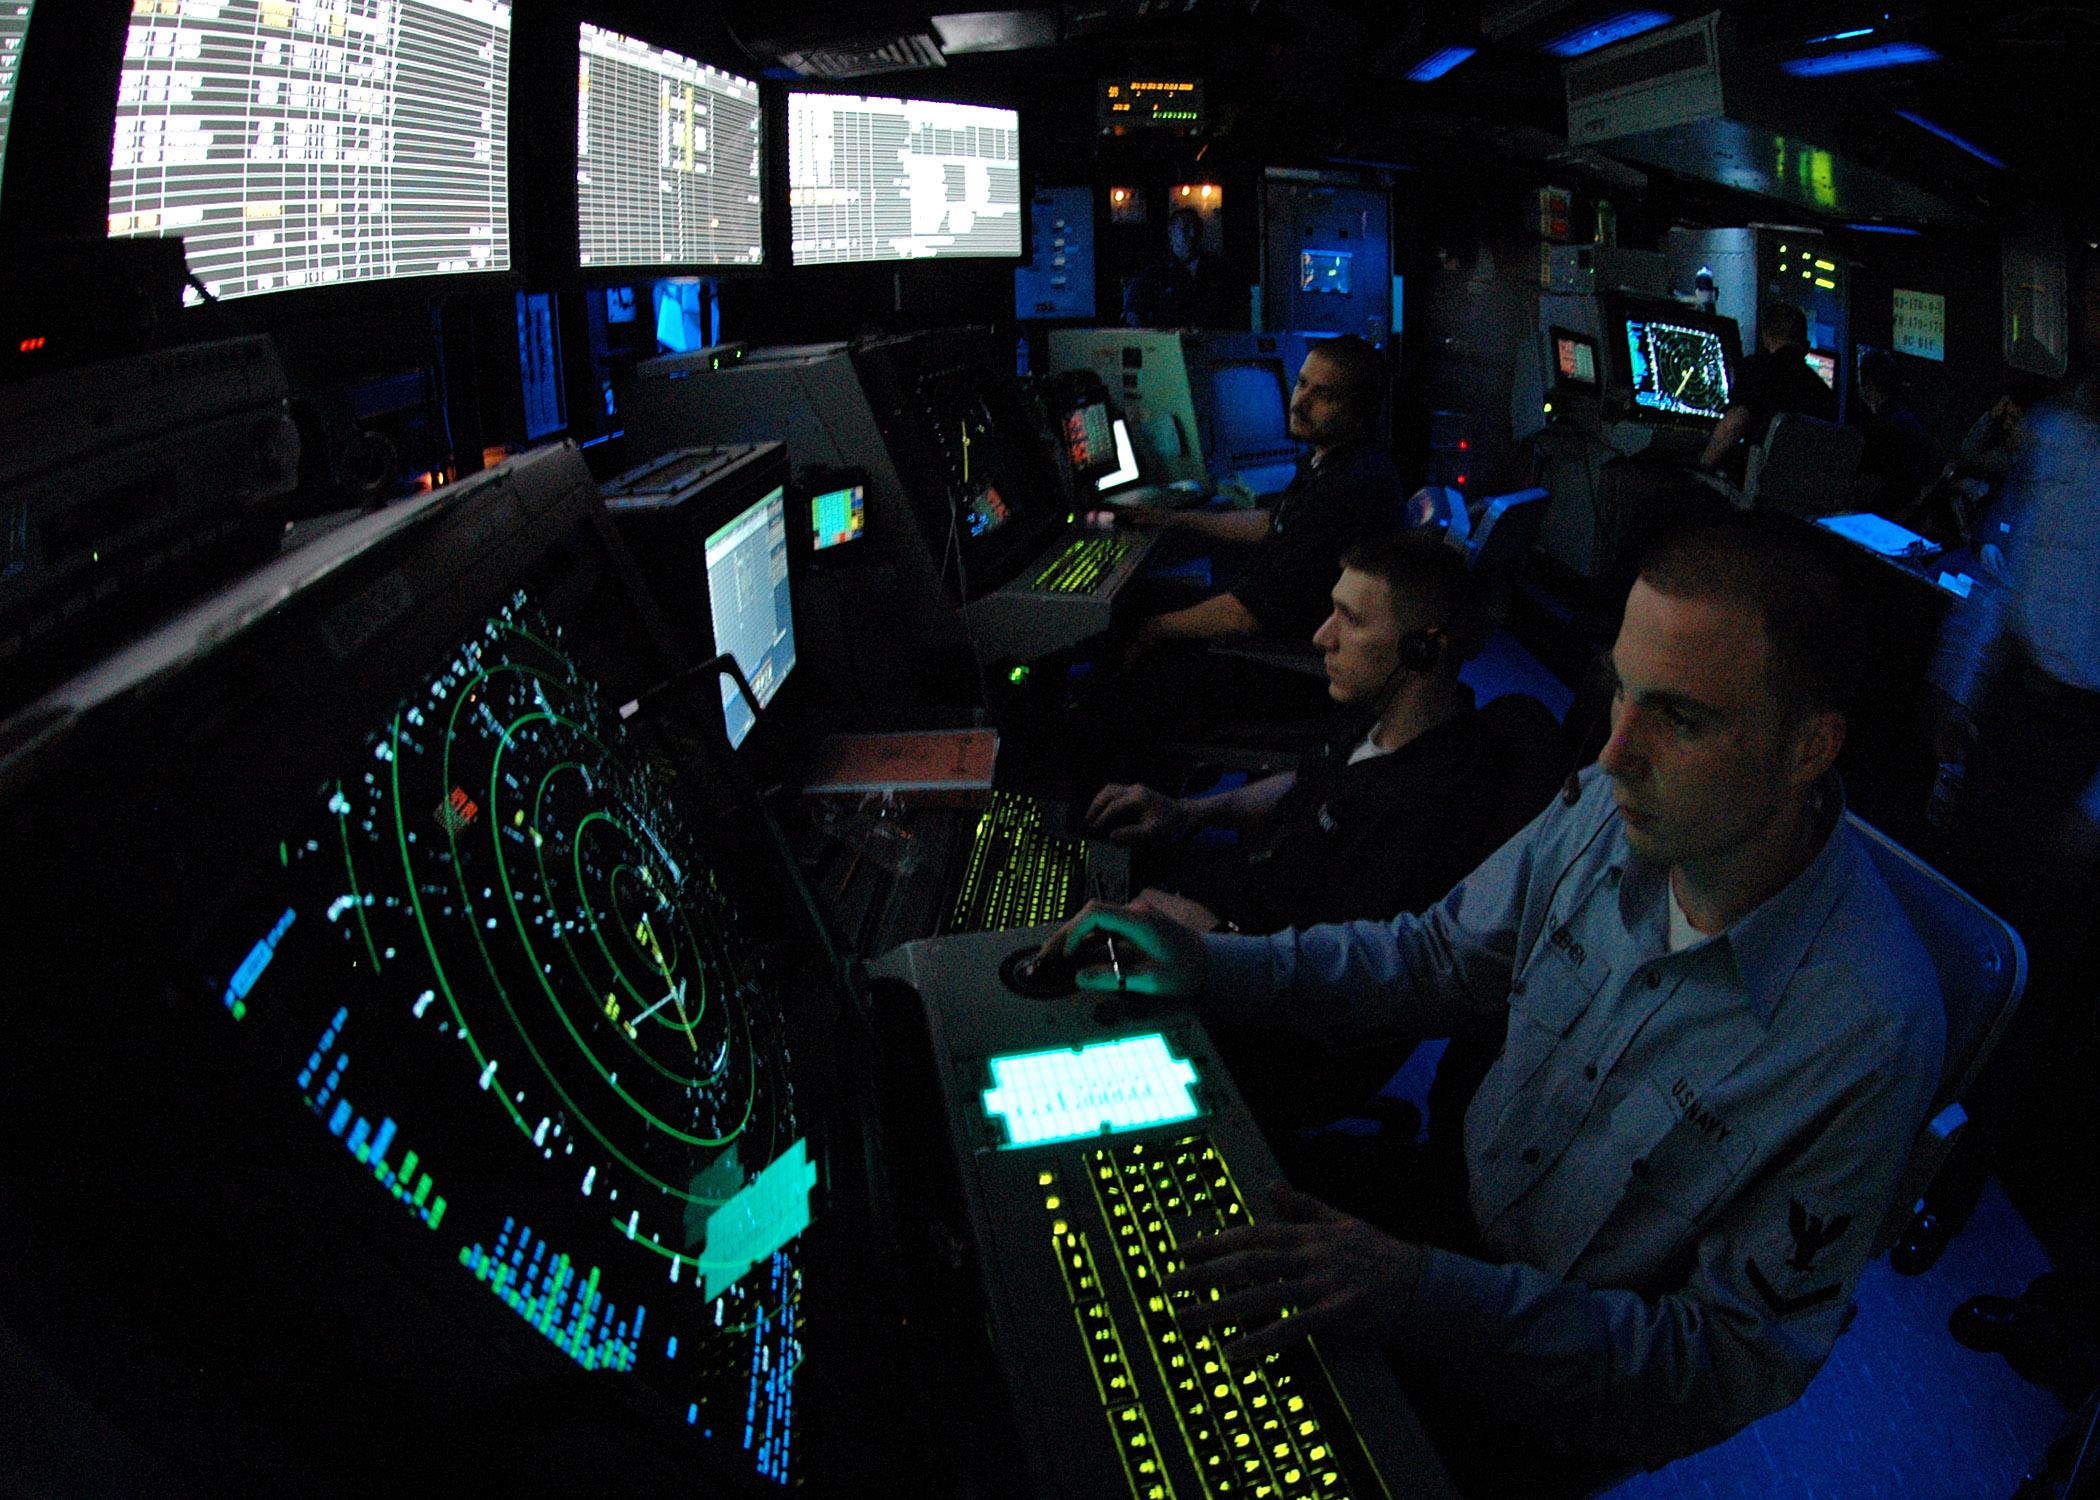 US_Navy_060505-N-9079D-025_Air_Traffic_Controller_3rd_Class_David_McKeehe_works_approach_controller_in_Carrier_Air_Traffic_Control_Center_%28CATTC%29.jpg